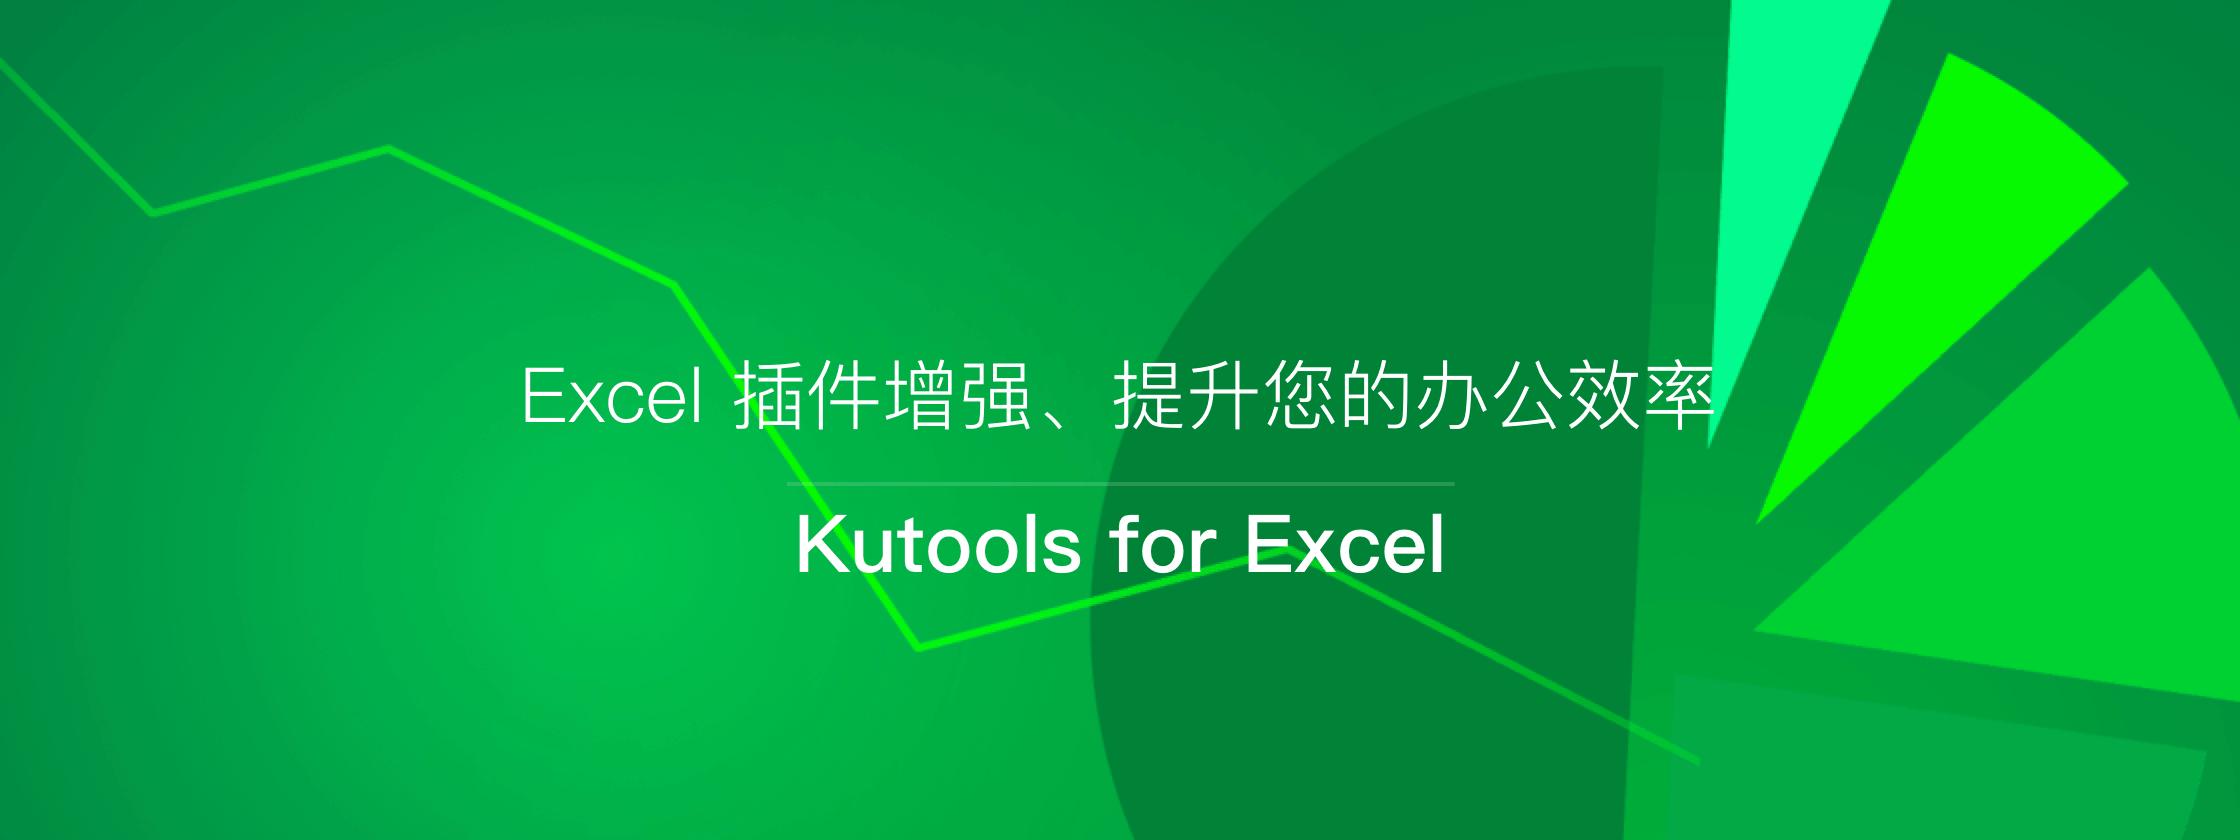 Kutools for Excel – Excel 插件增强、提升您的办公效率